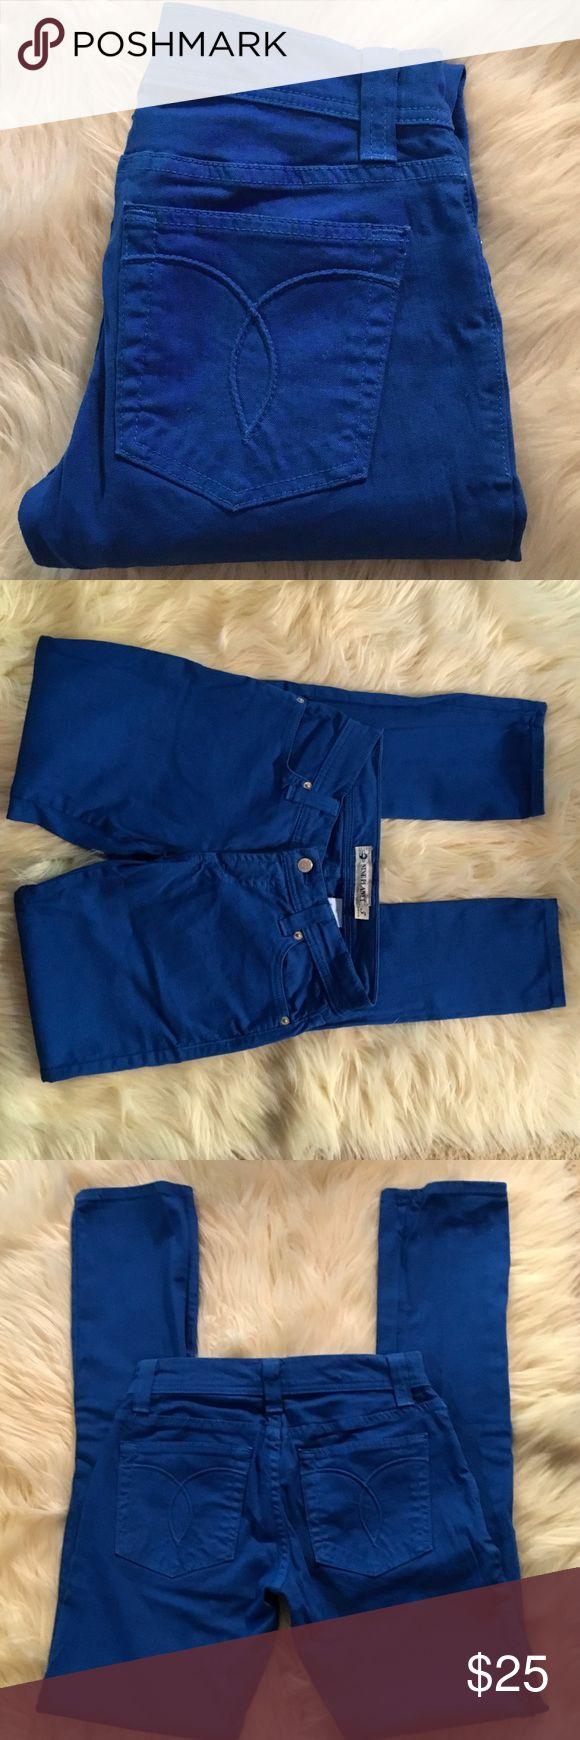 "9 Planet Yale Blue Skinny Jeans Size 3 LIKE NEW 9 Planet Yale Blue Skinny Jeans. Like New. Inseam 32"", Rise 7"" Size 3 9 Planet Jeans Skinny"